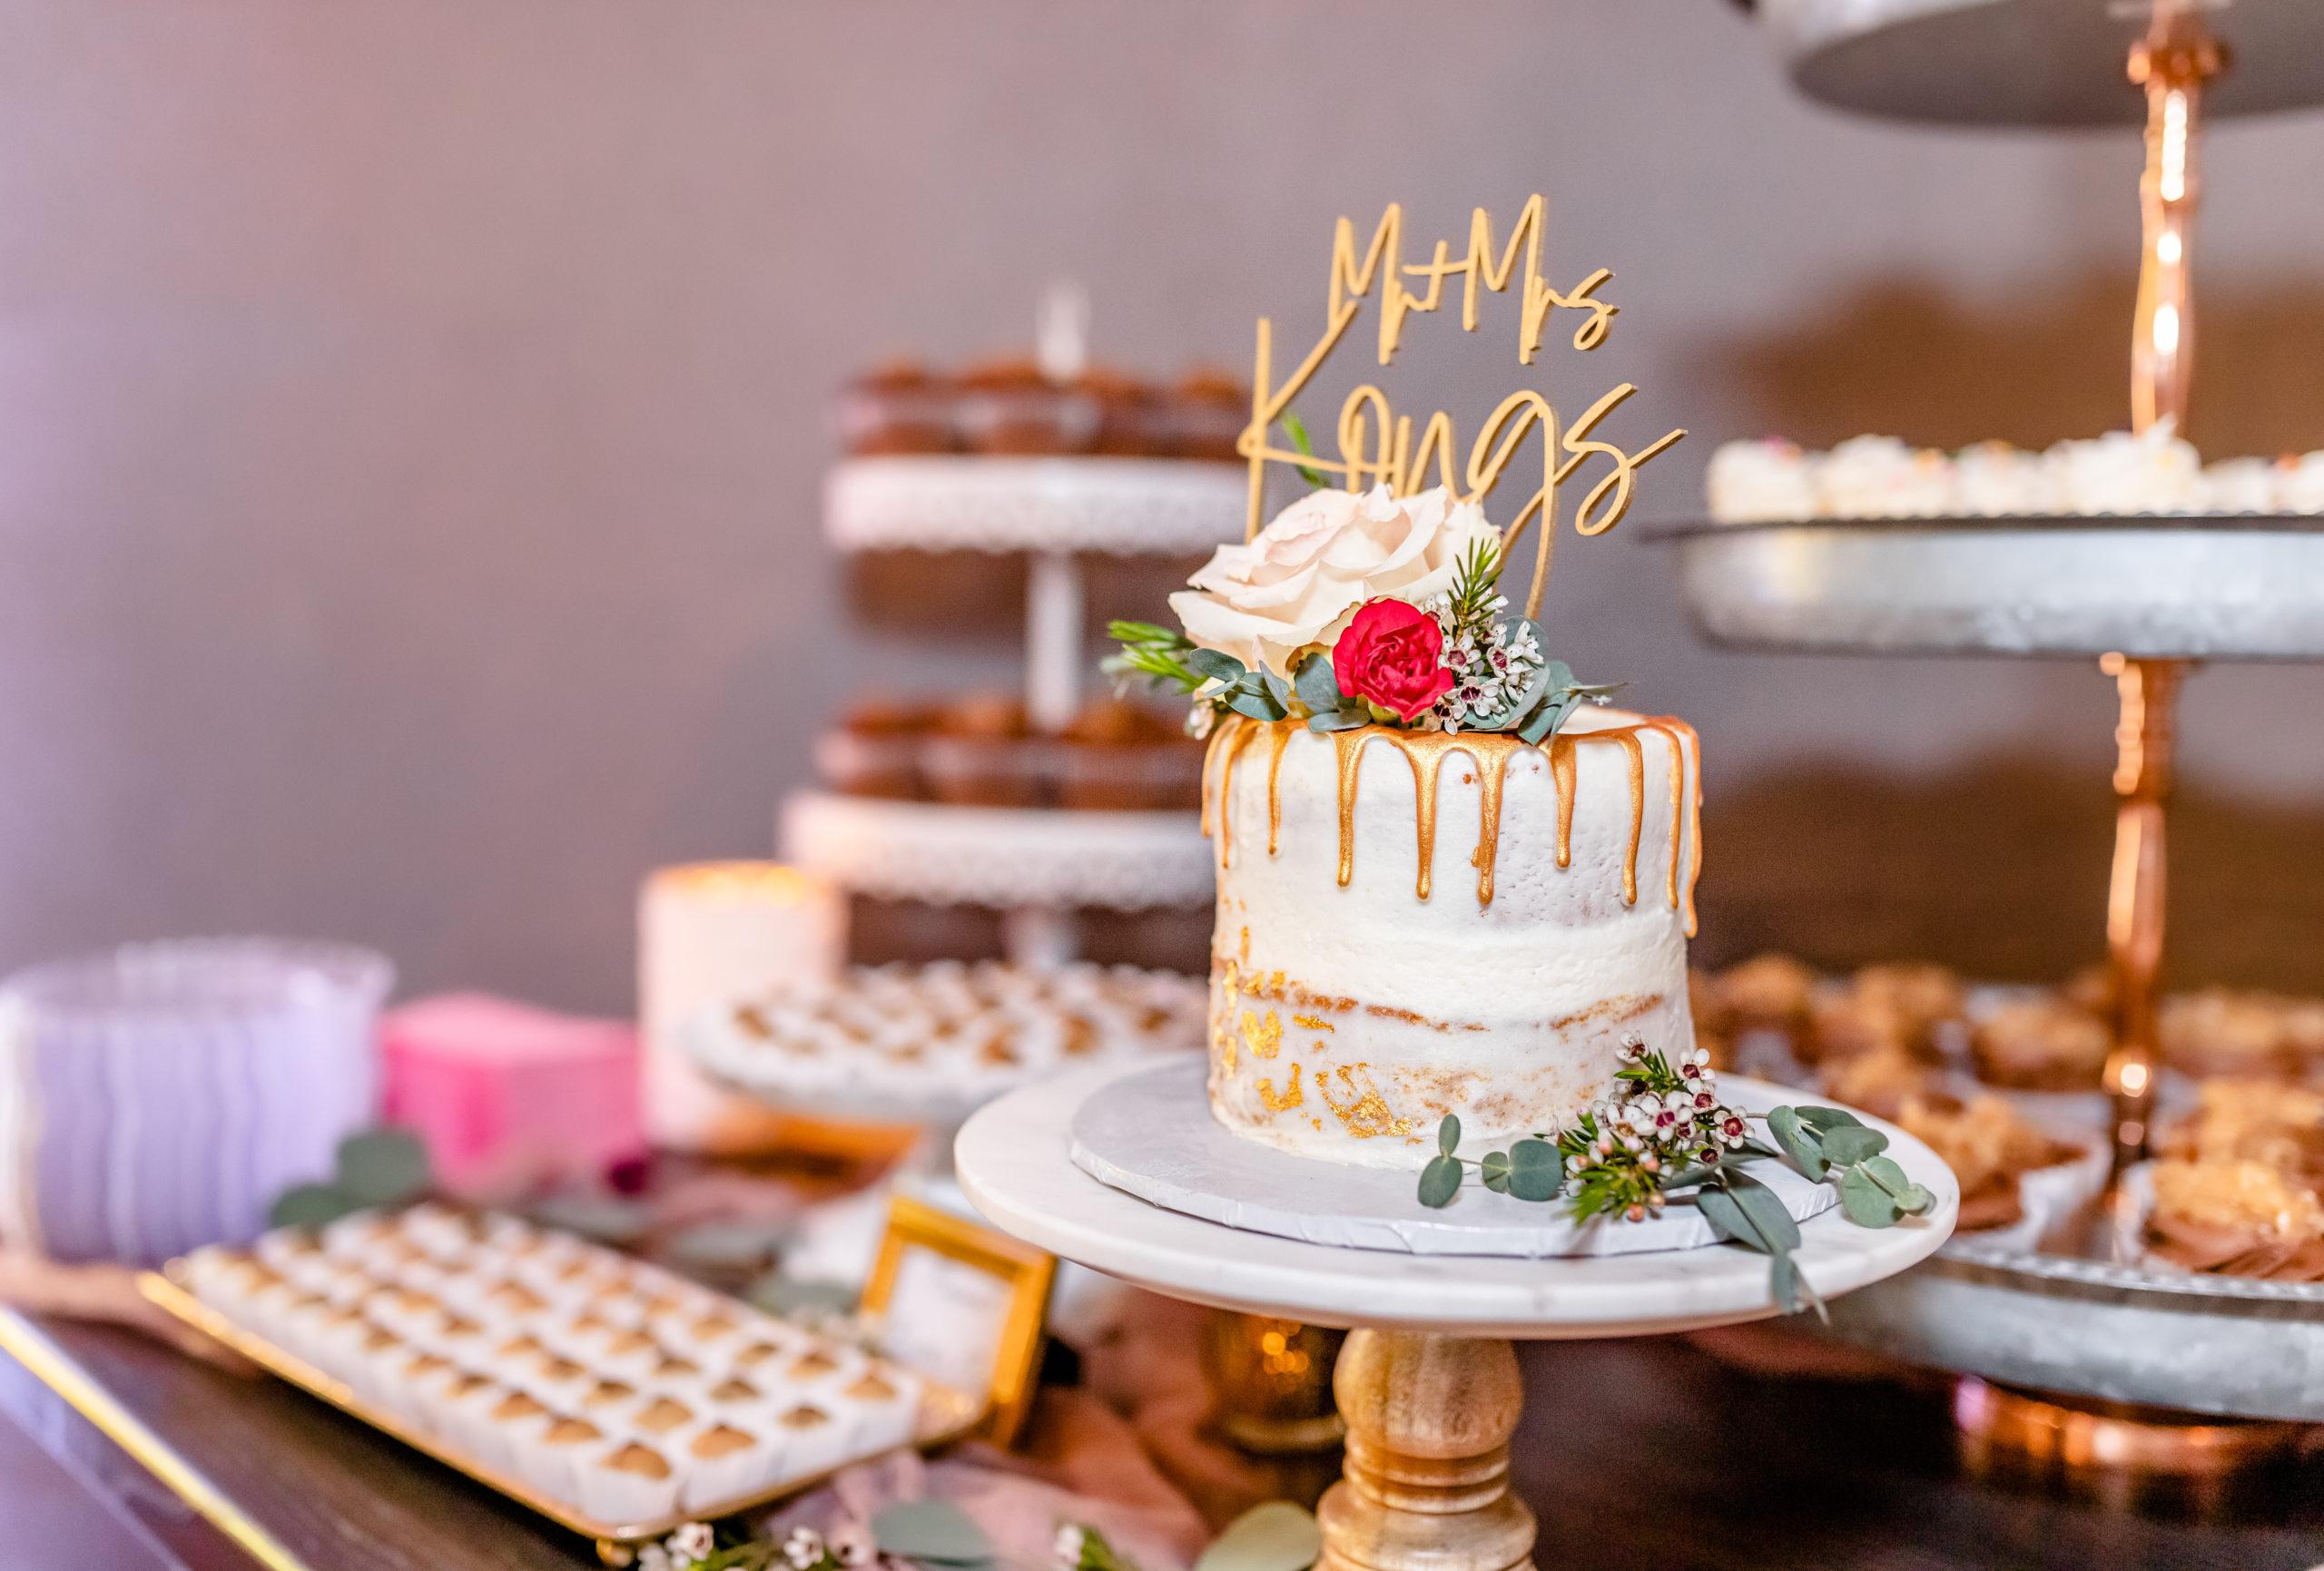 Wedding cake, wedding topper with last name